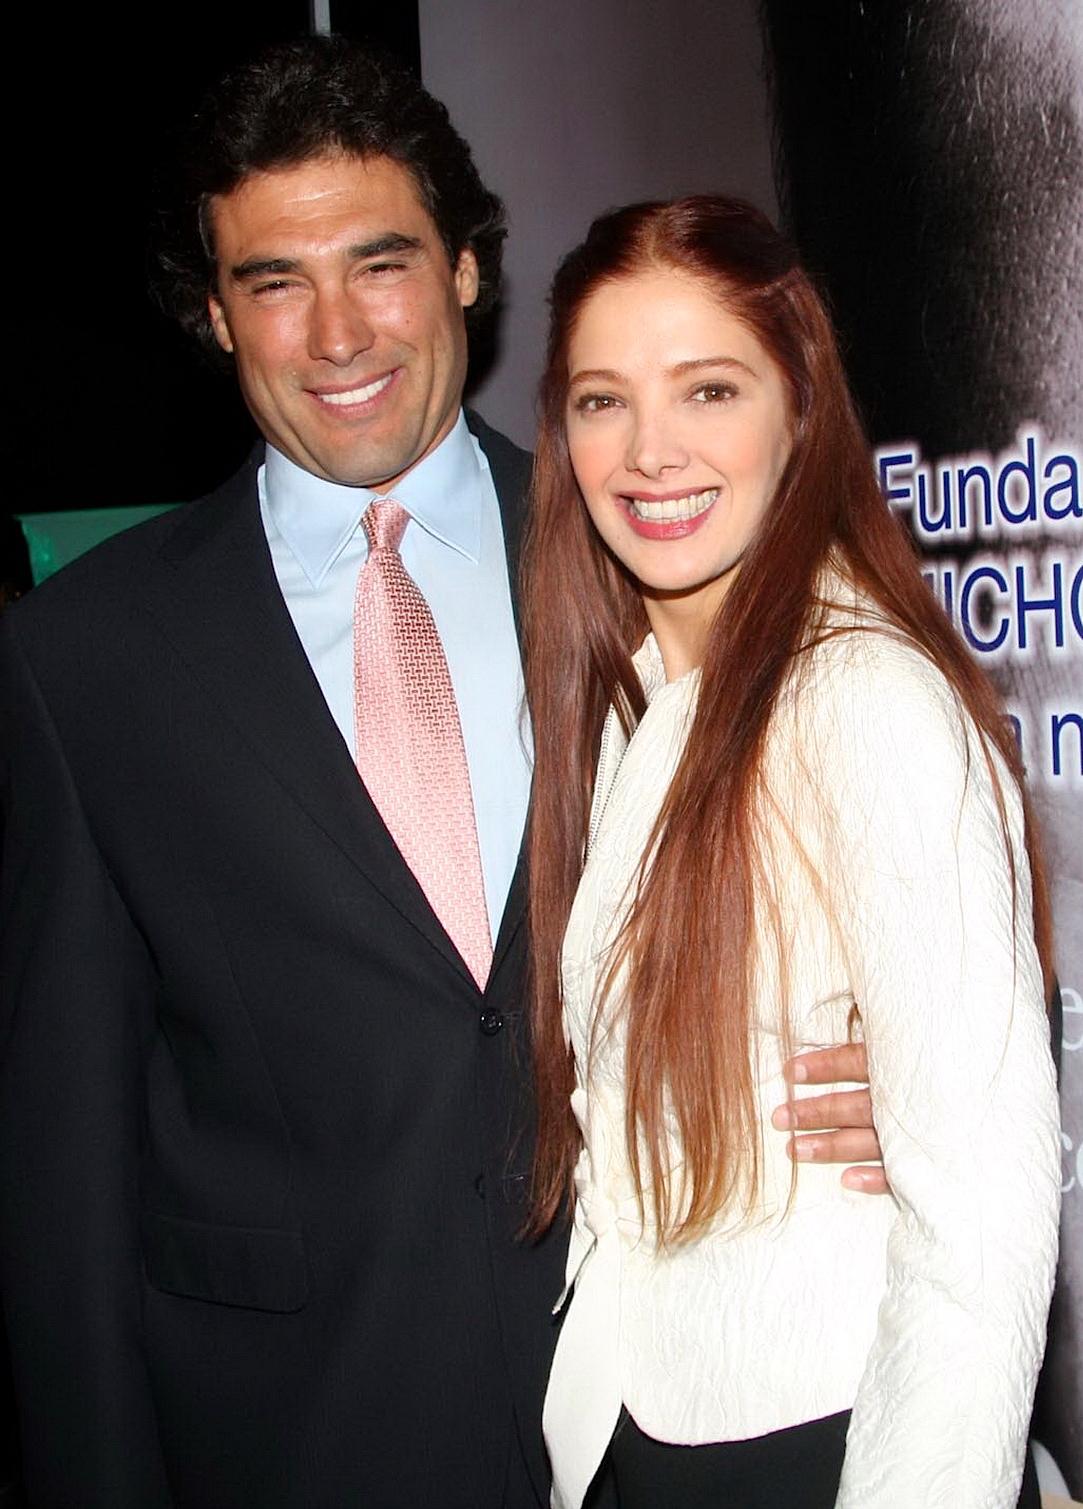 Adela Noriego Eduardy Yanez